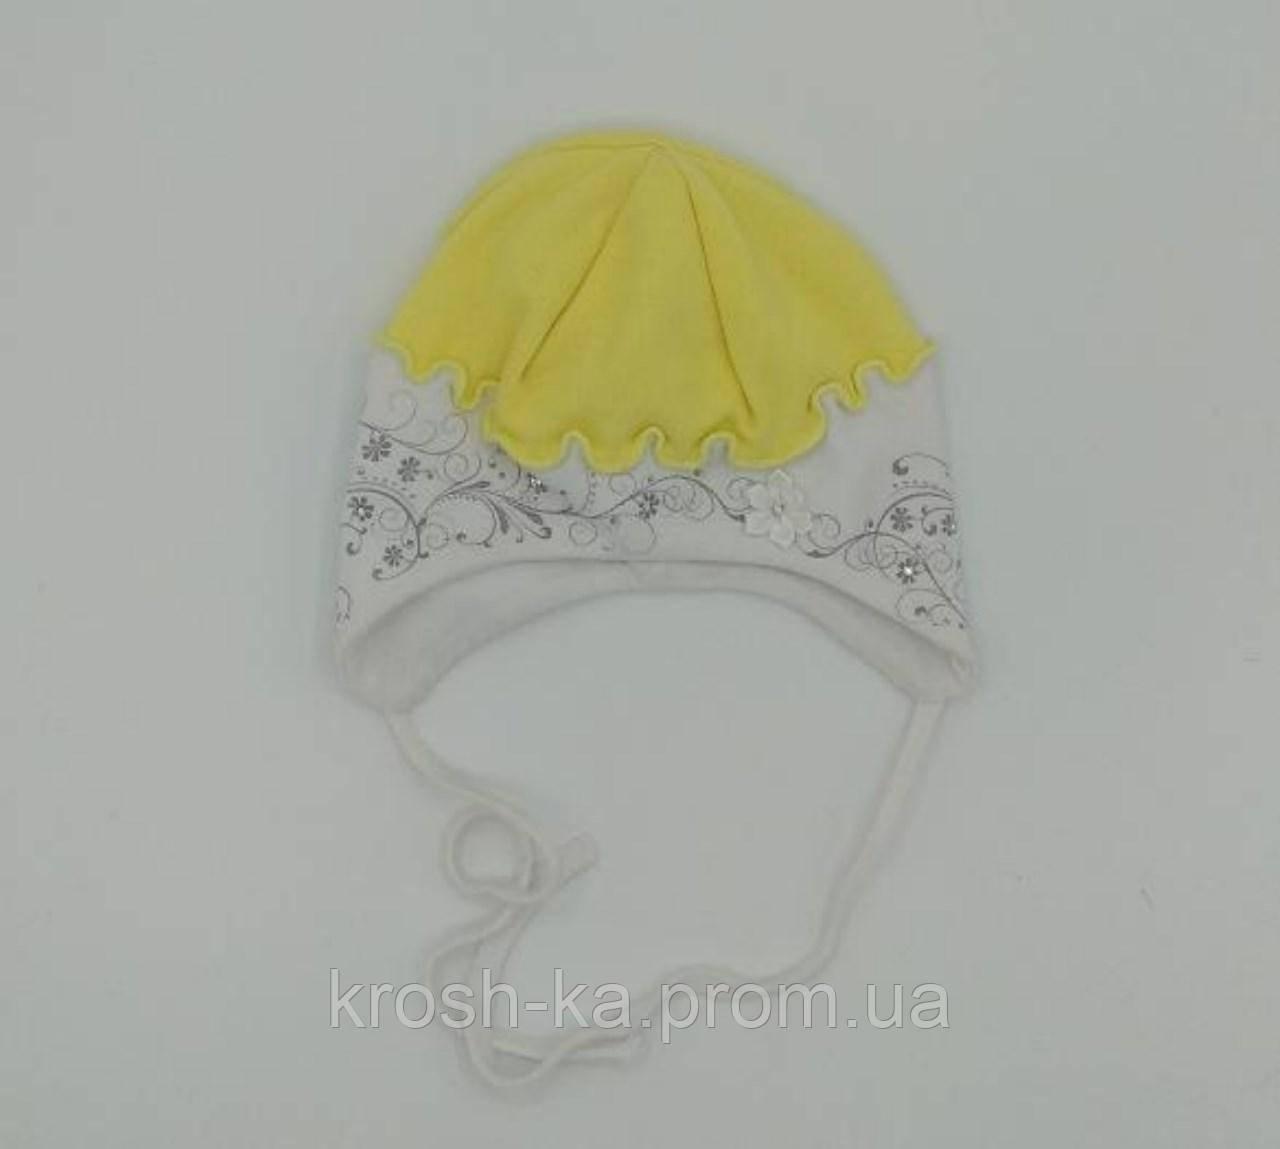 Шапочка для новорожденных на завязках жёлтая Ляля(36-38)р D.Star Украина 0077